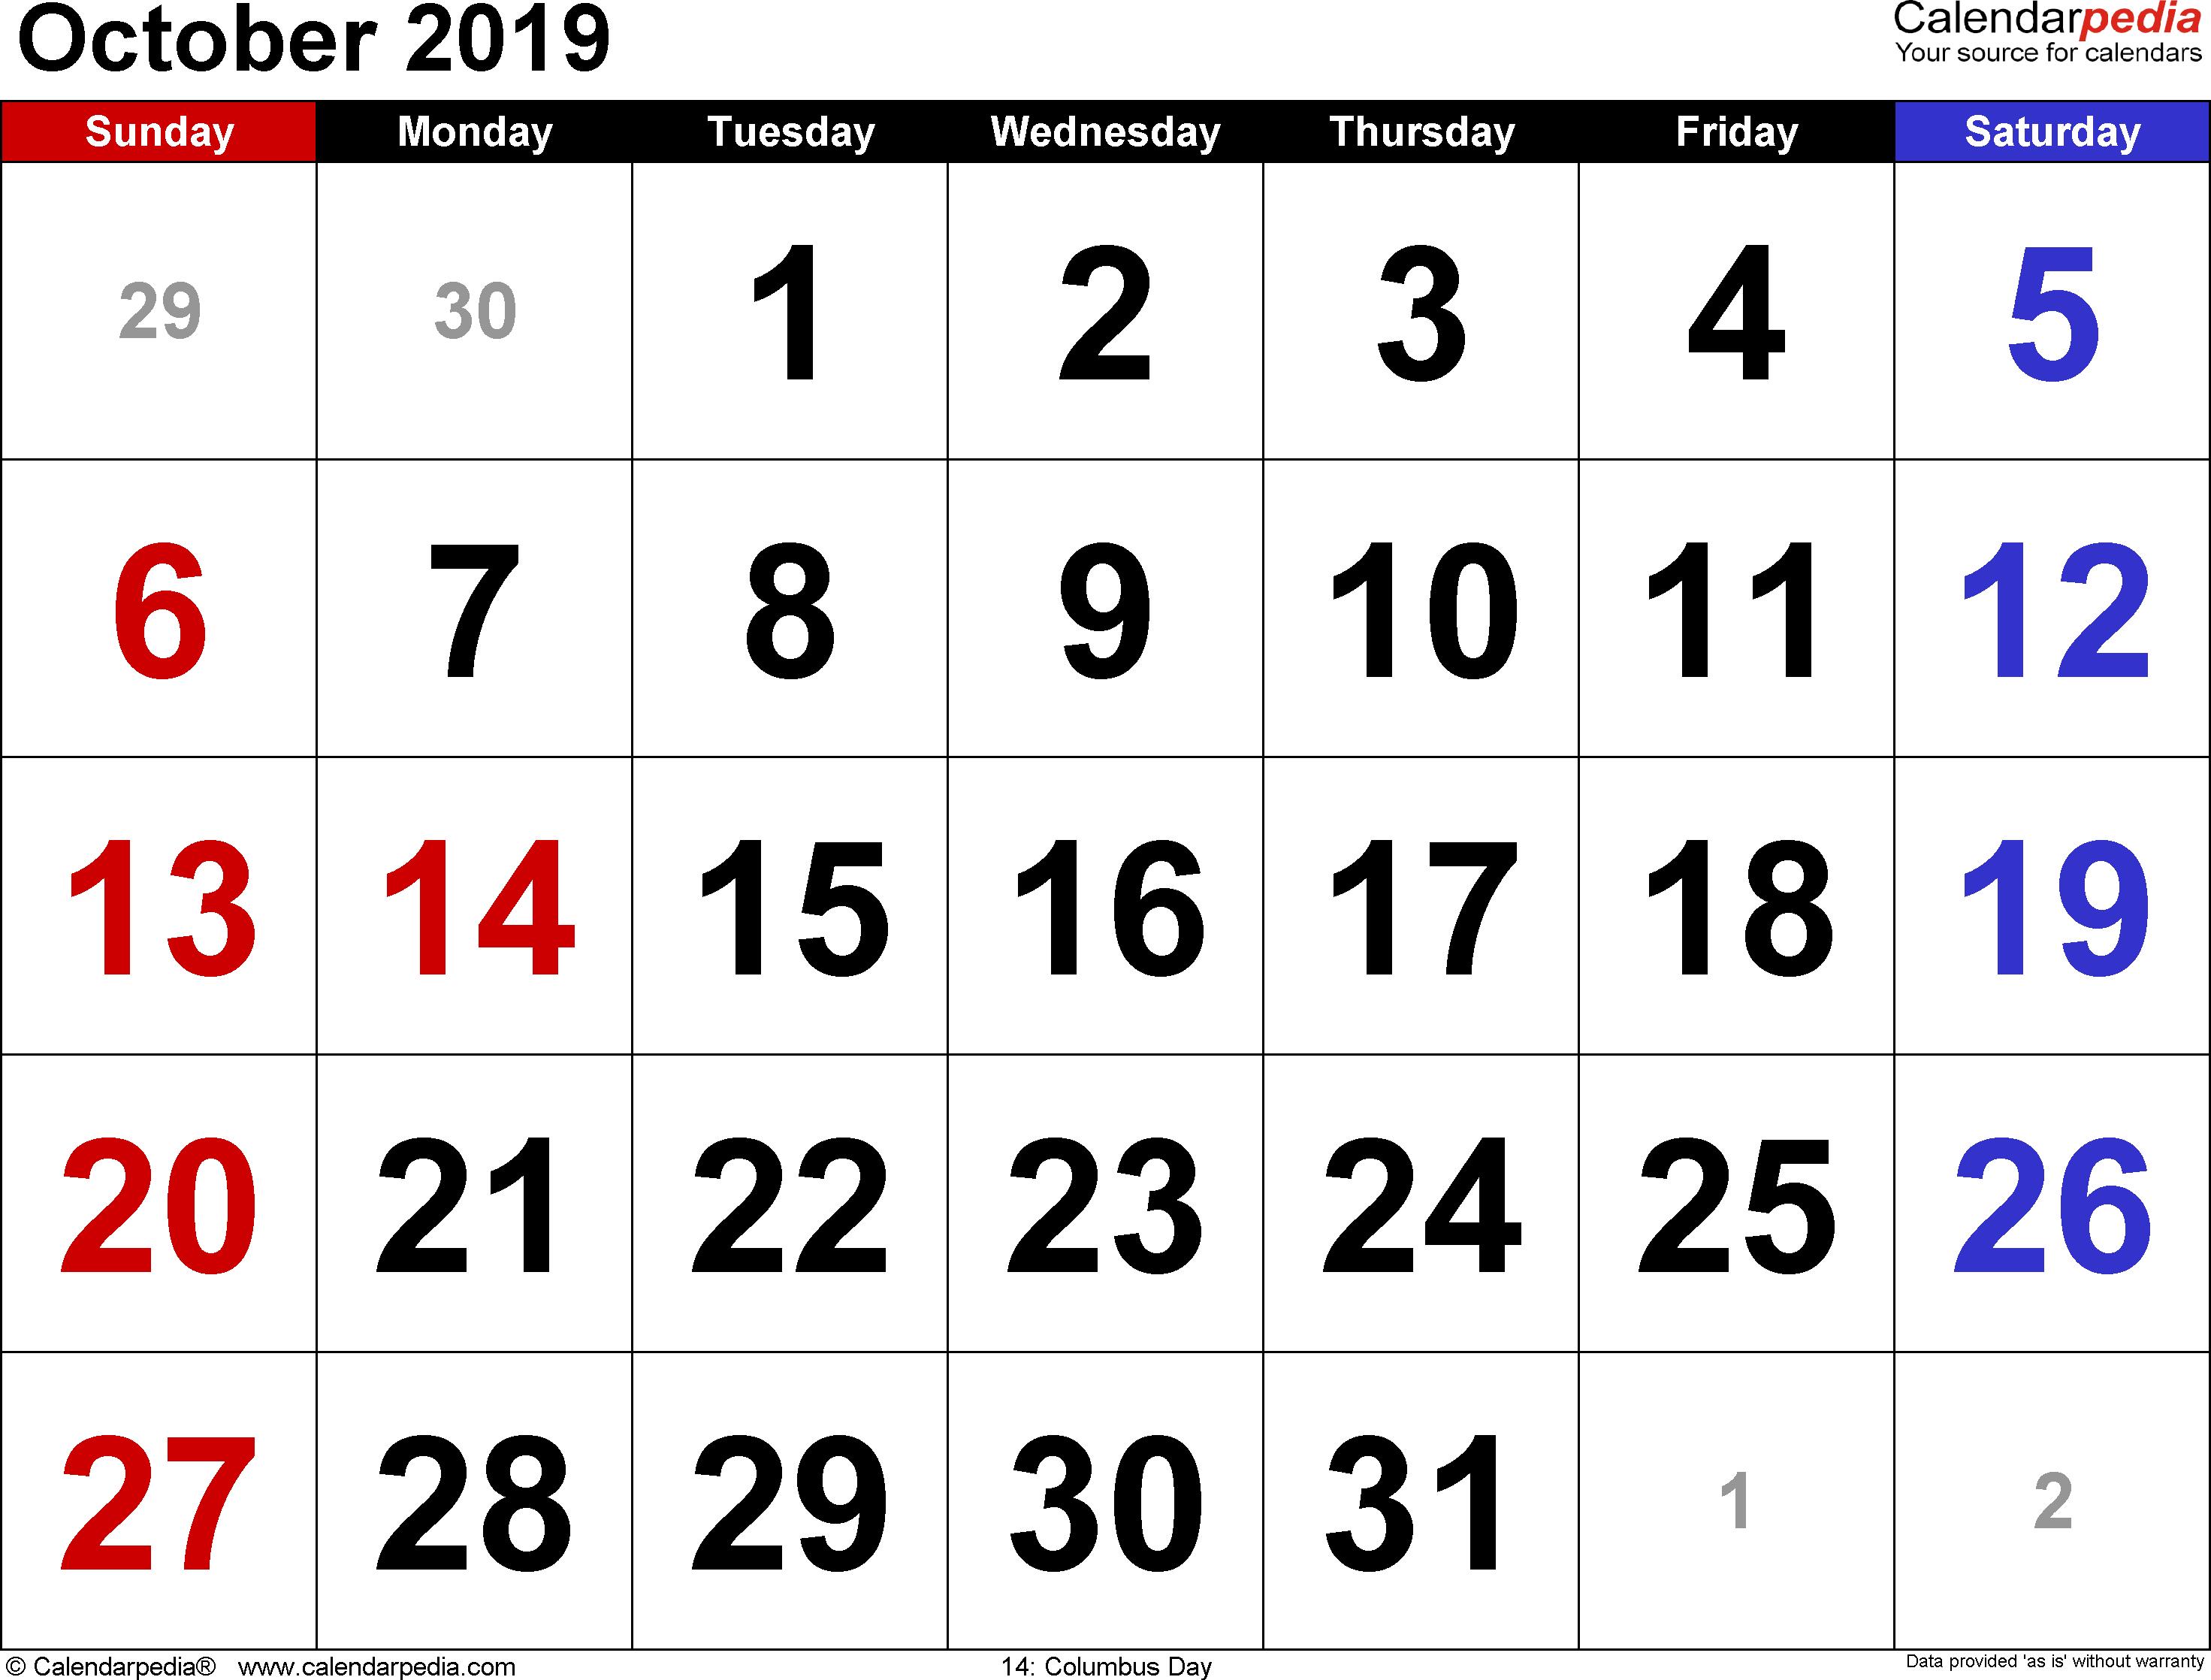 October 2019 Calendars For Word, Excel & Pdf with Calendar October 2019 Australia Images